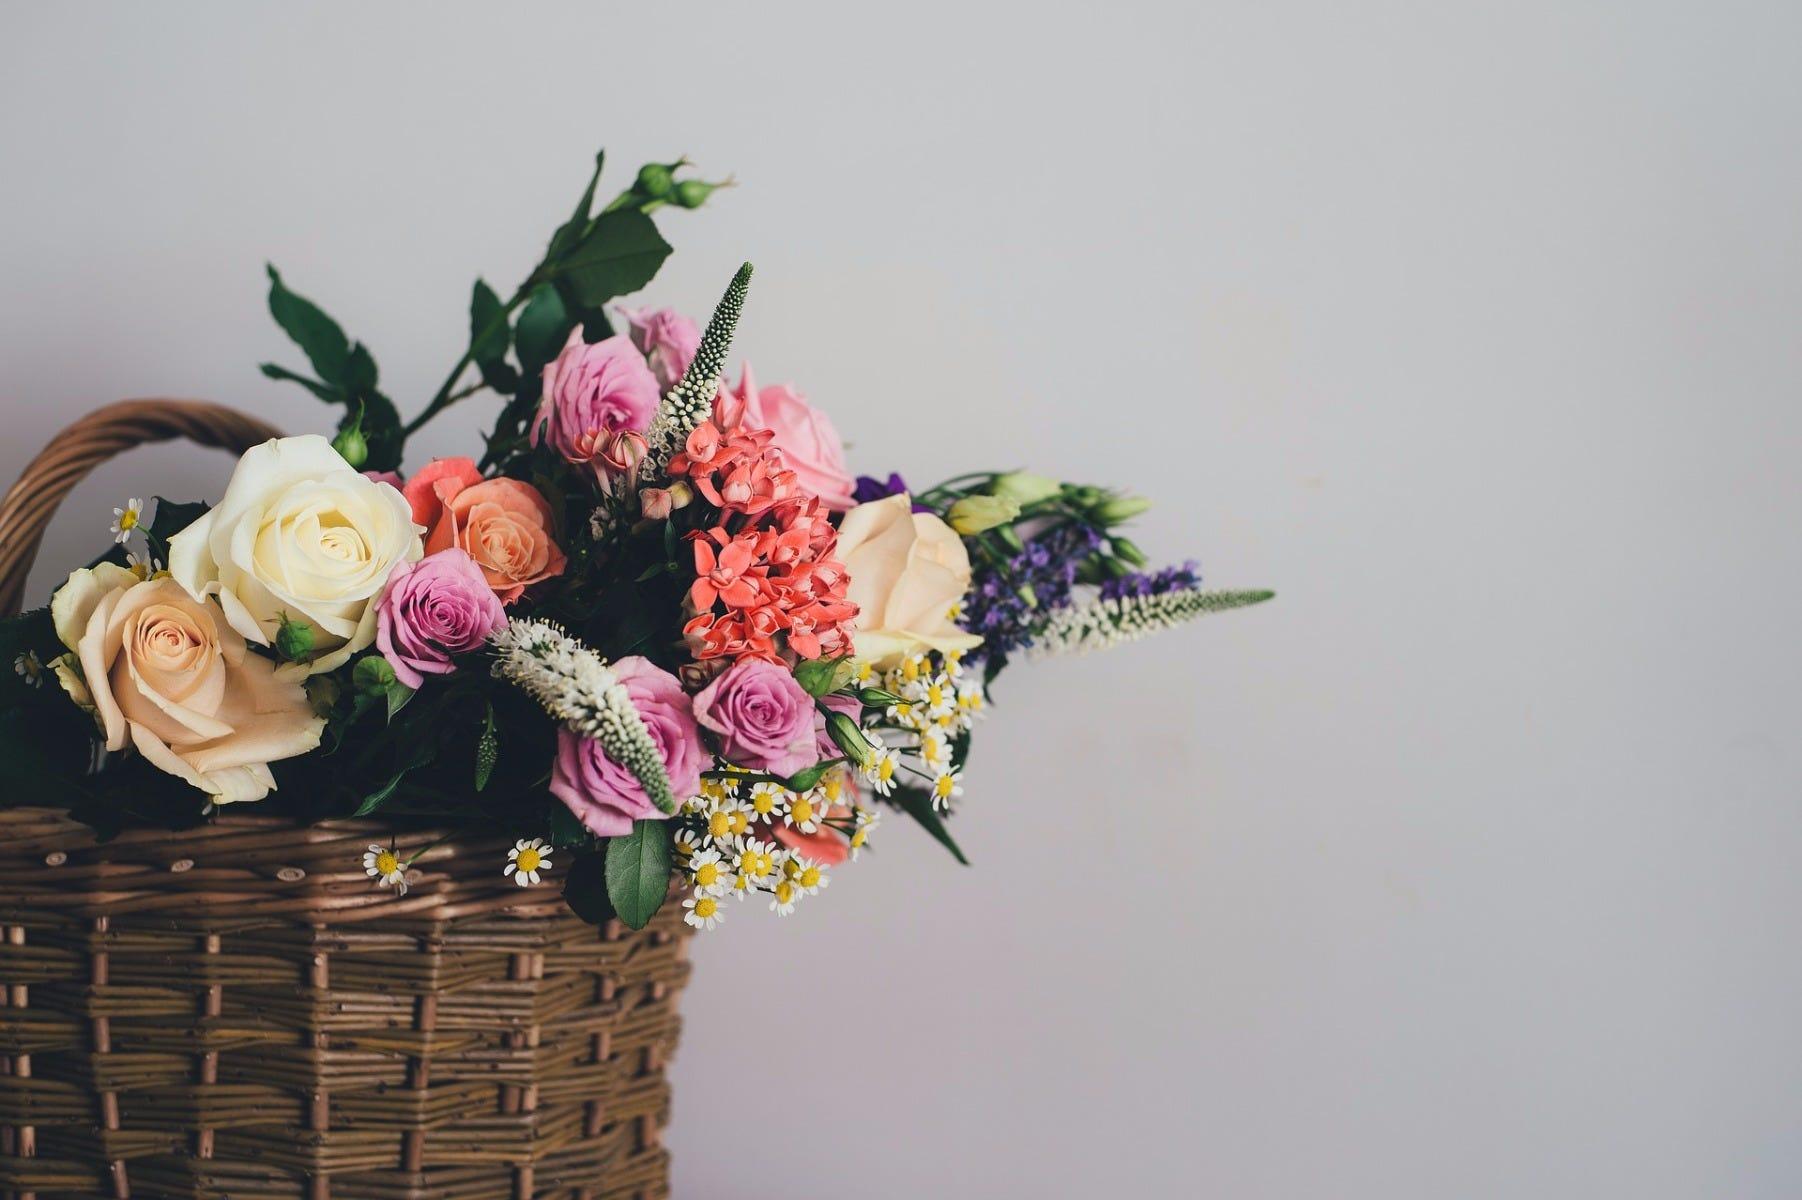 Send mom a year long supply of fresh flowers